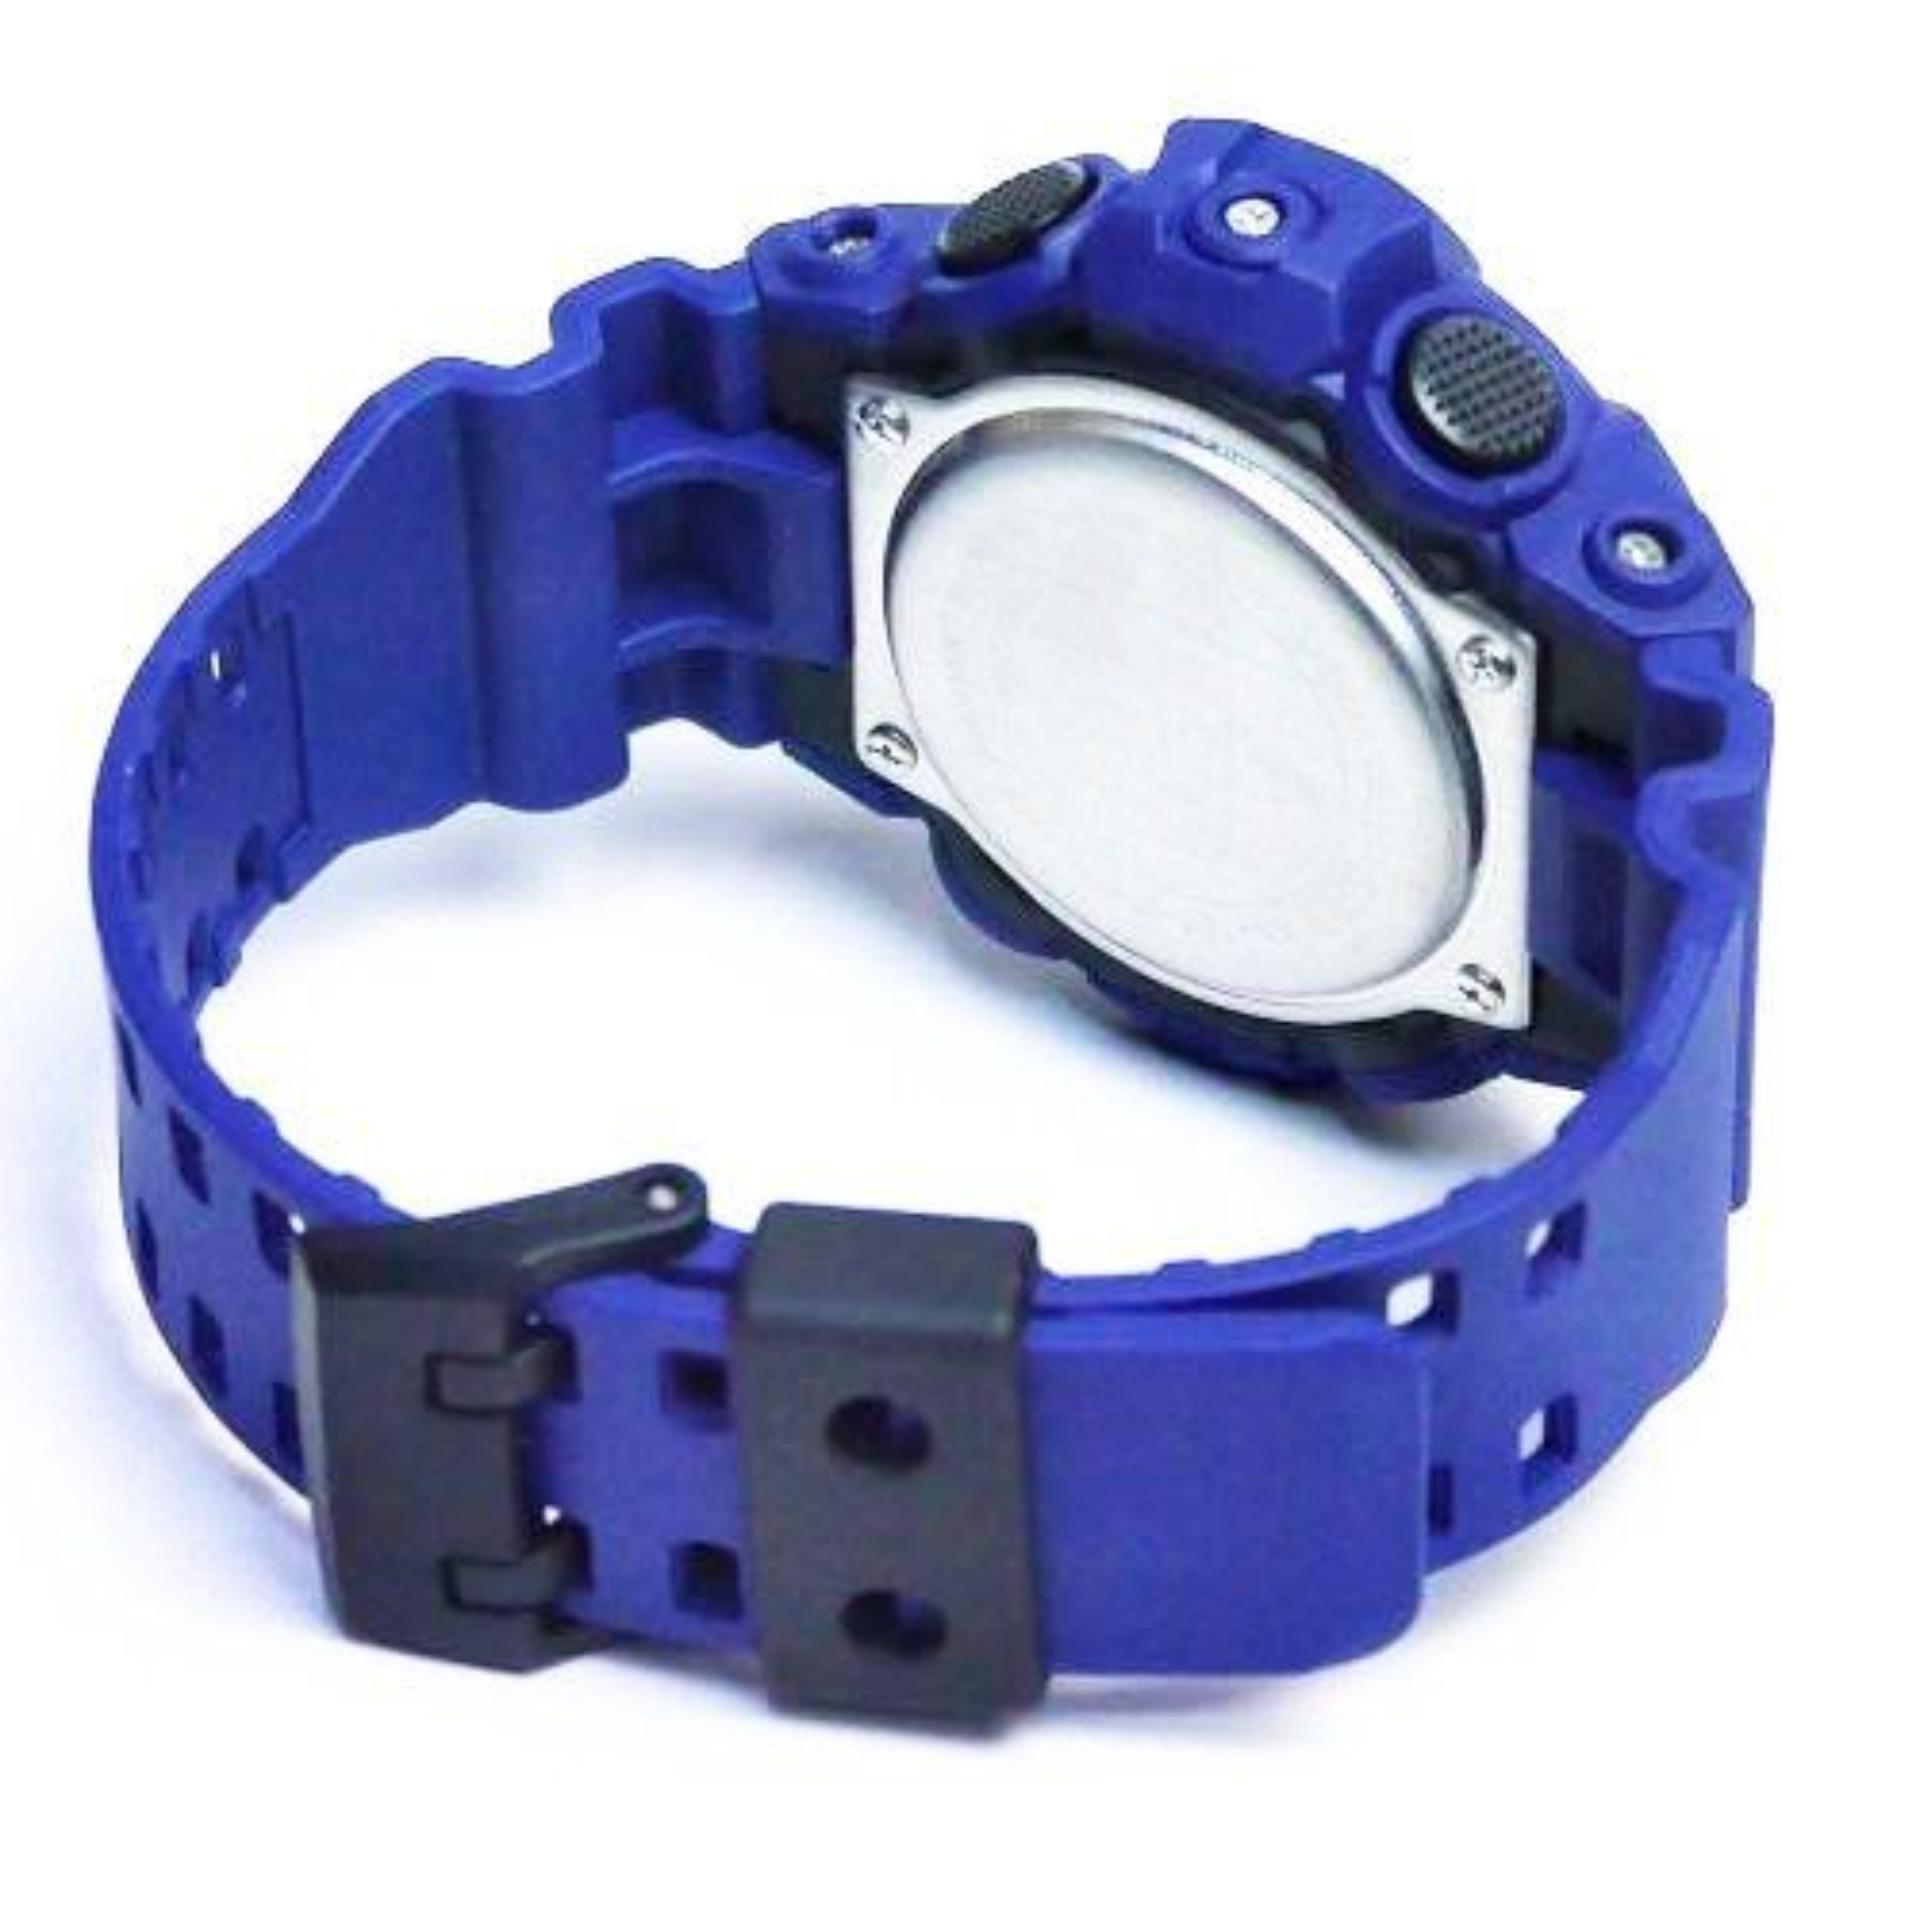 Casio G Shock Dual Time Resin Starp Quartz Movement Jam Tangan Pria Protrek Prg 270 1adr Black